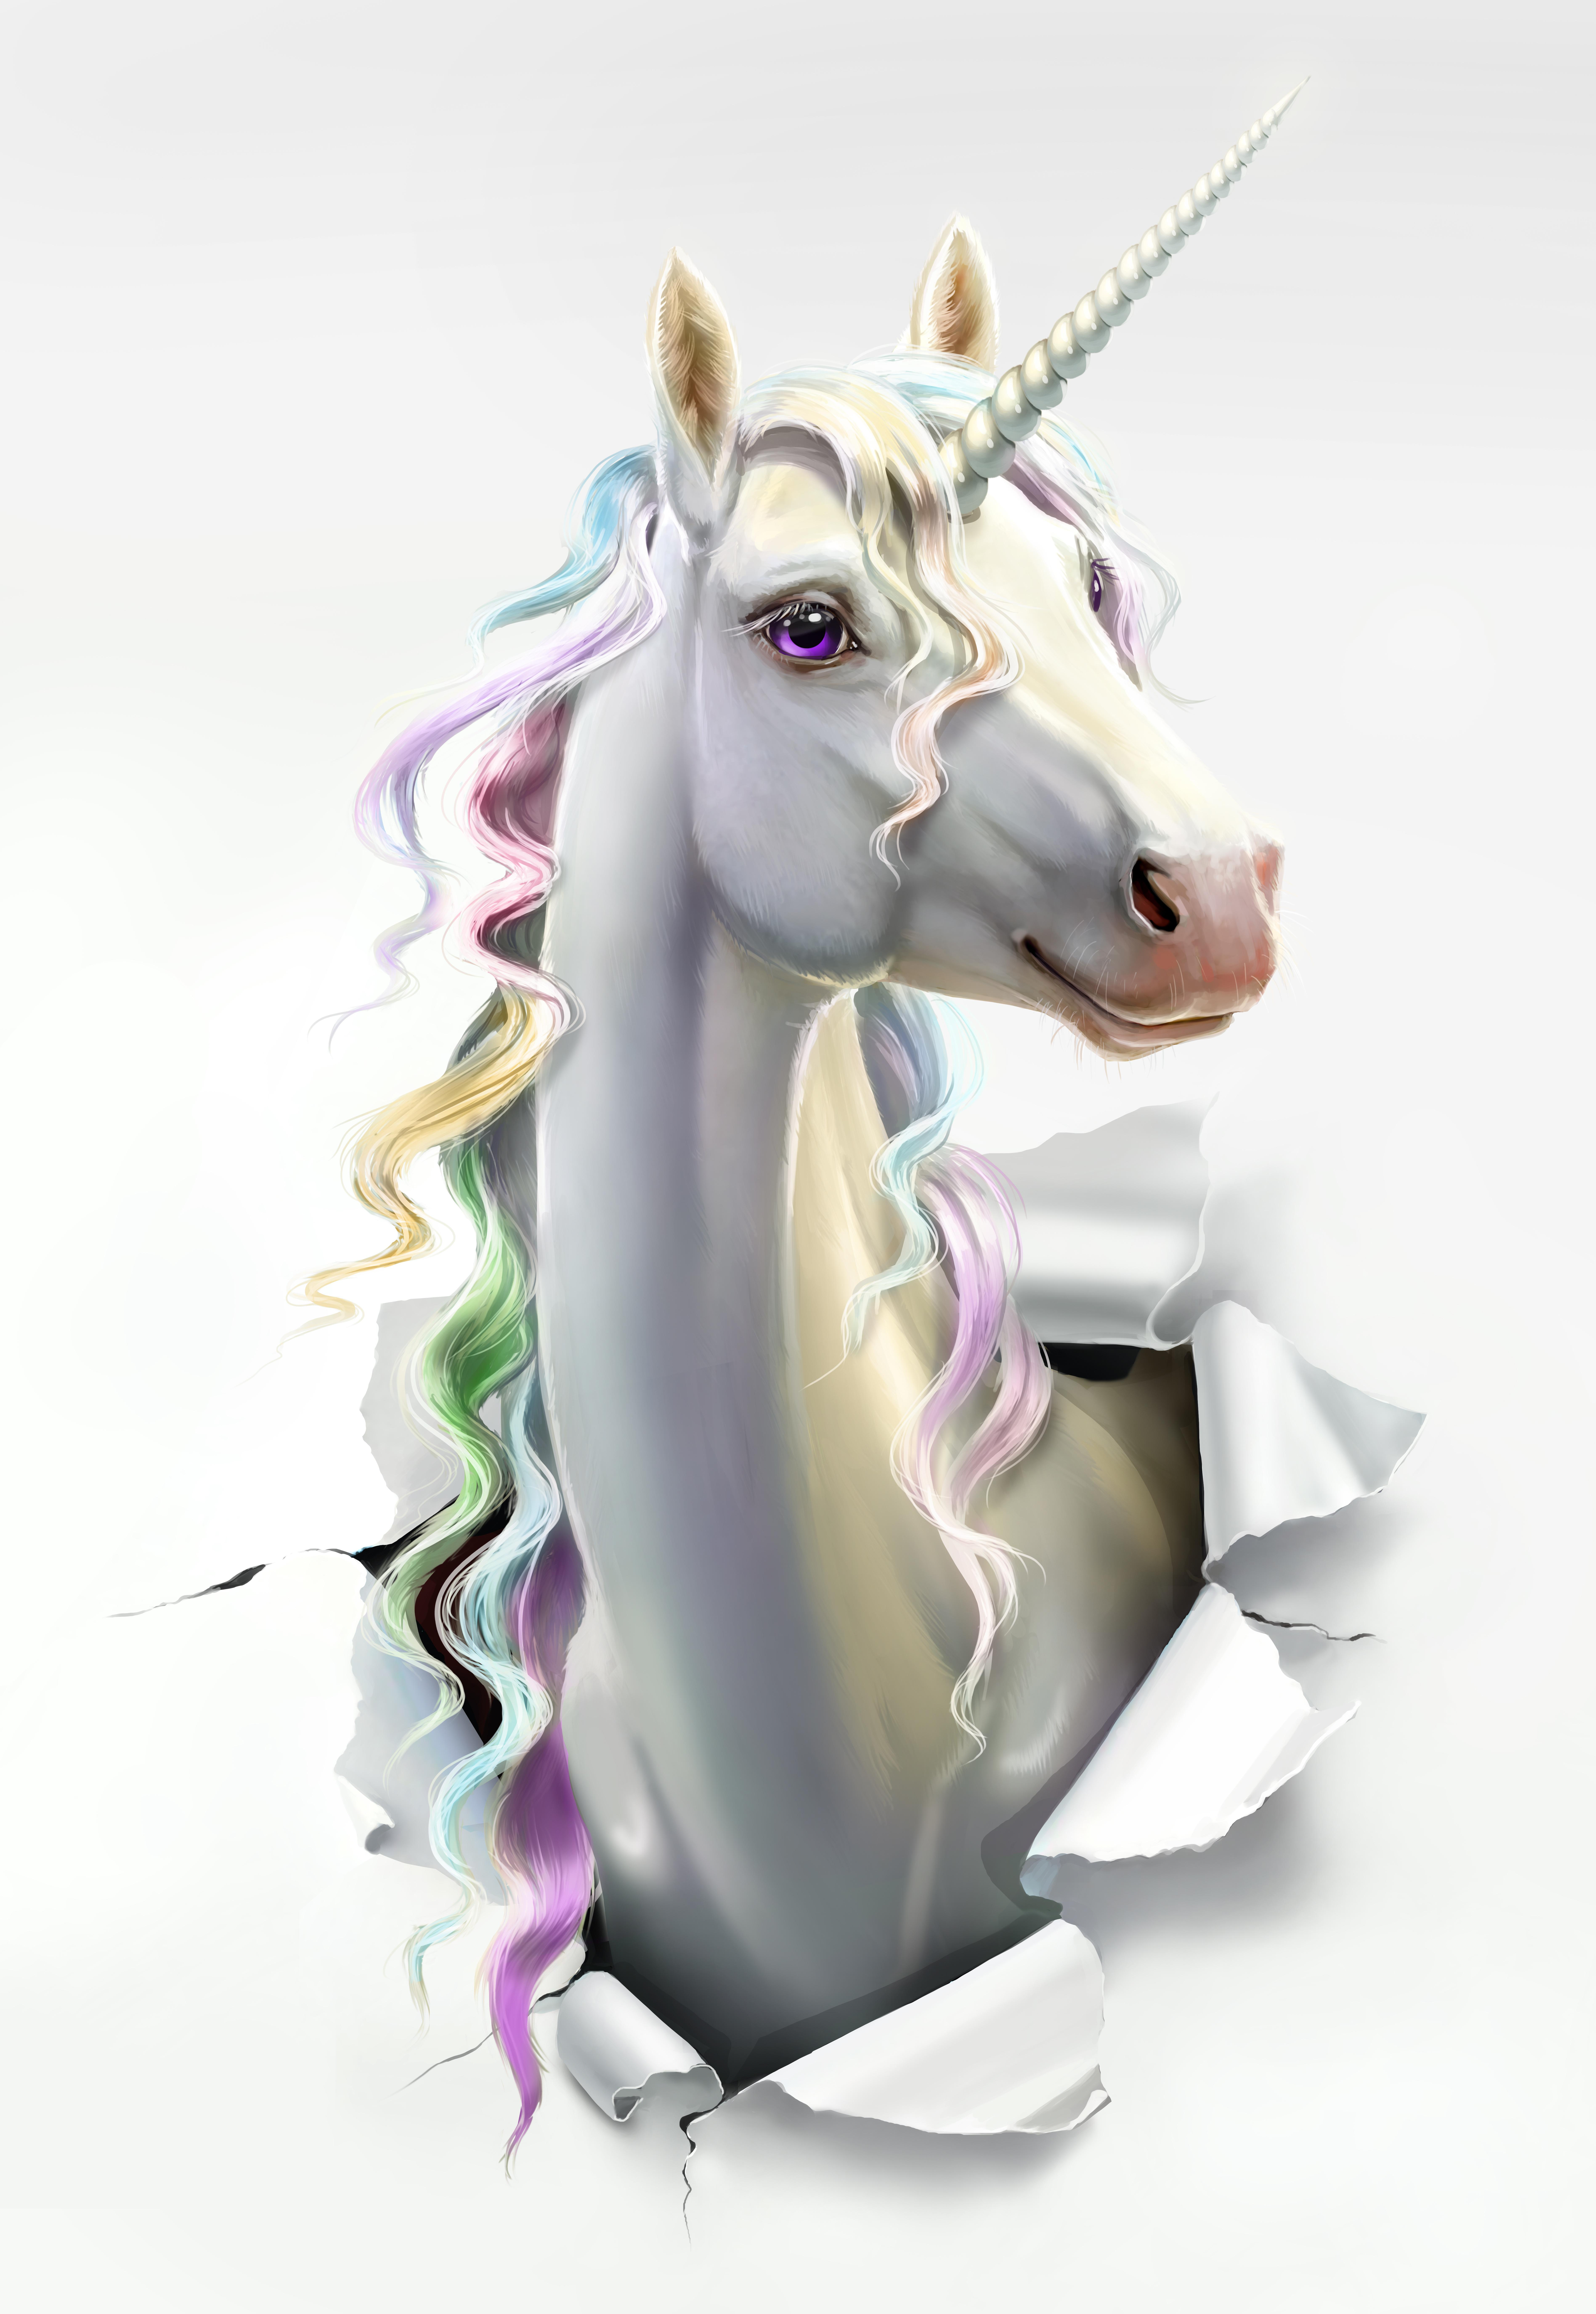 unicorn breaks through the paper, close-up